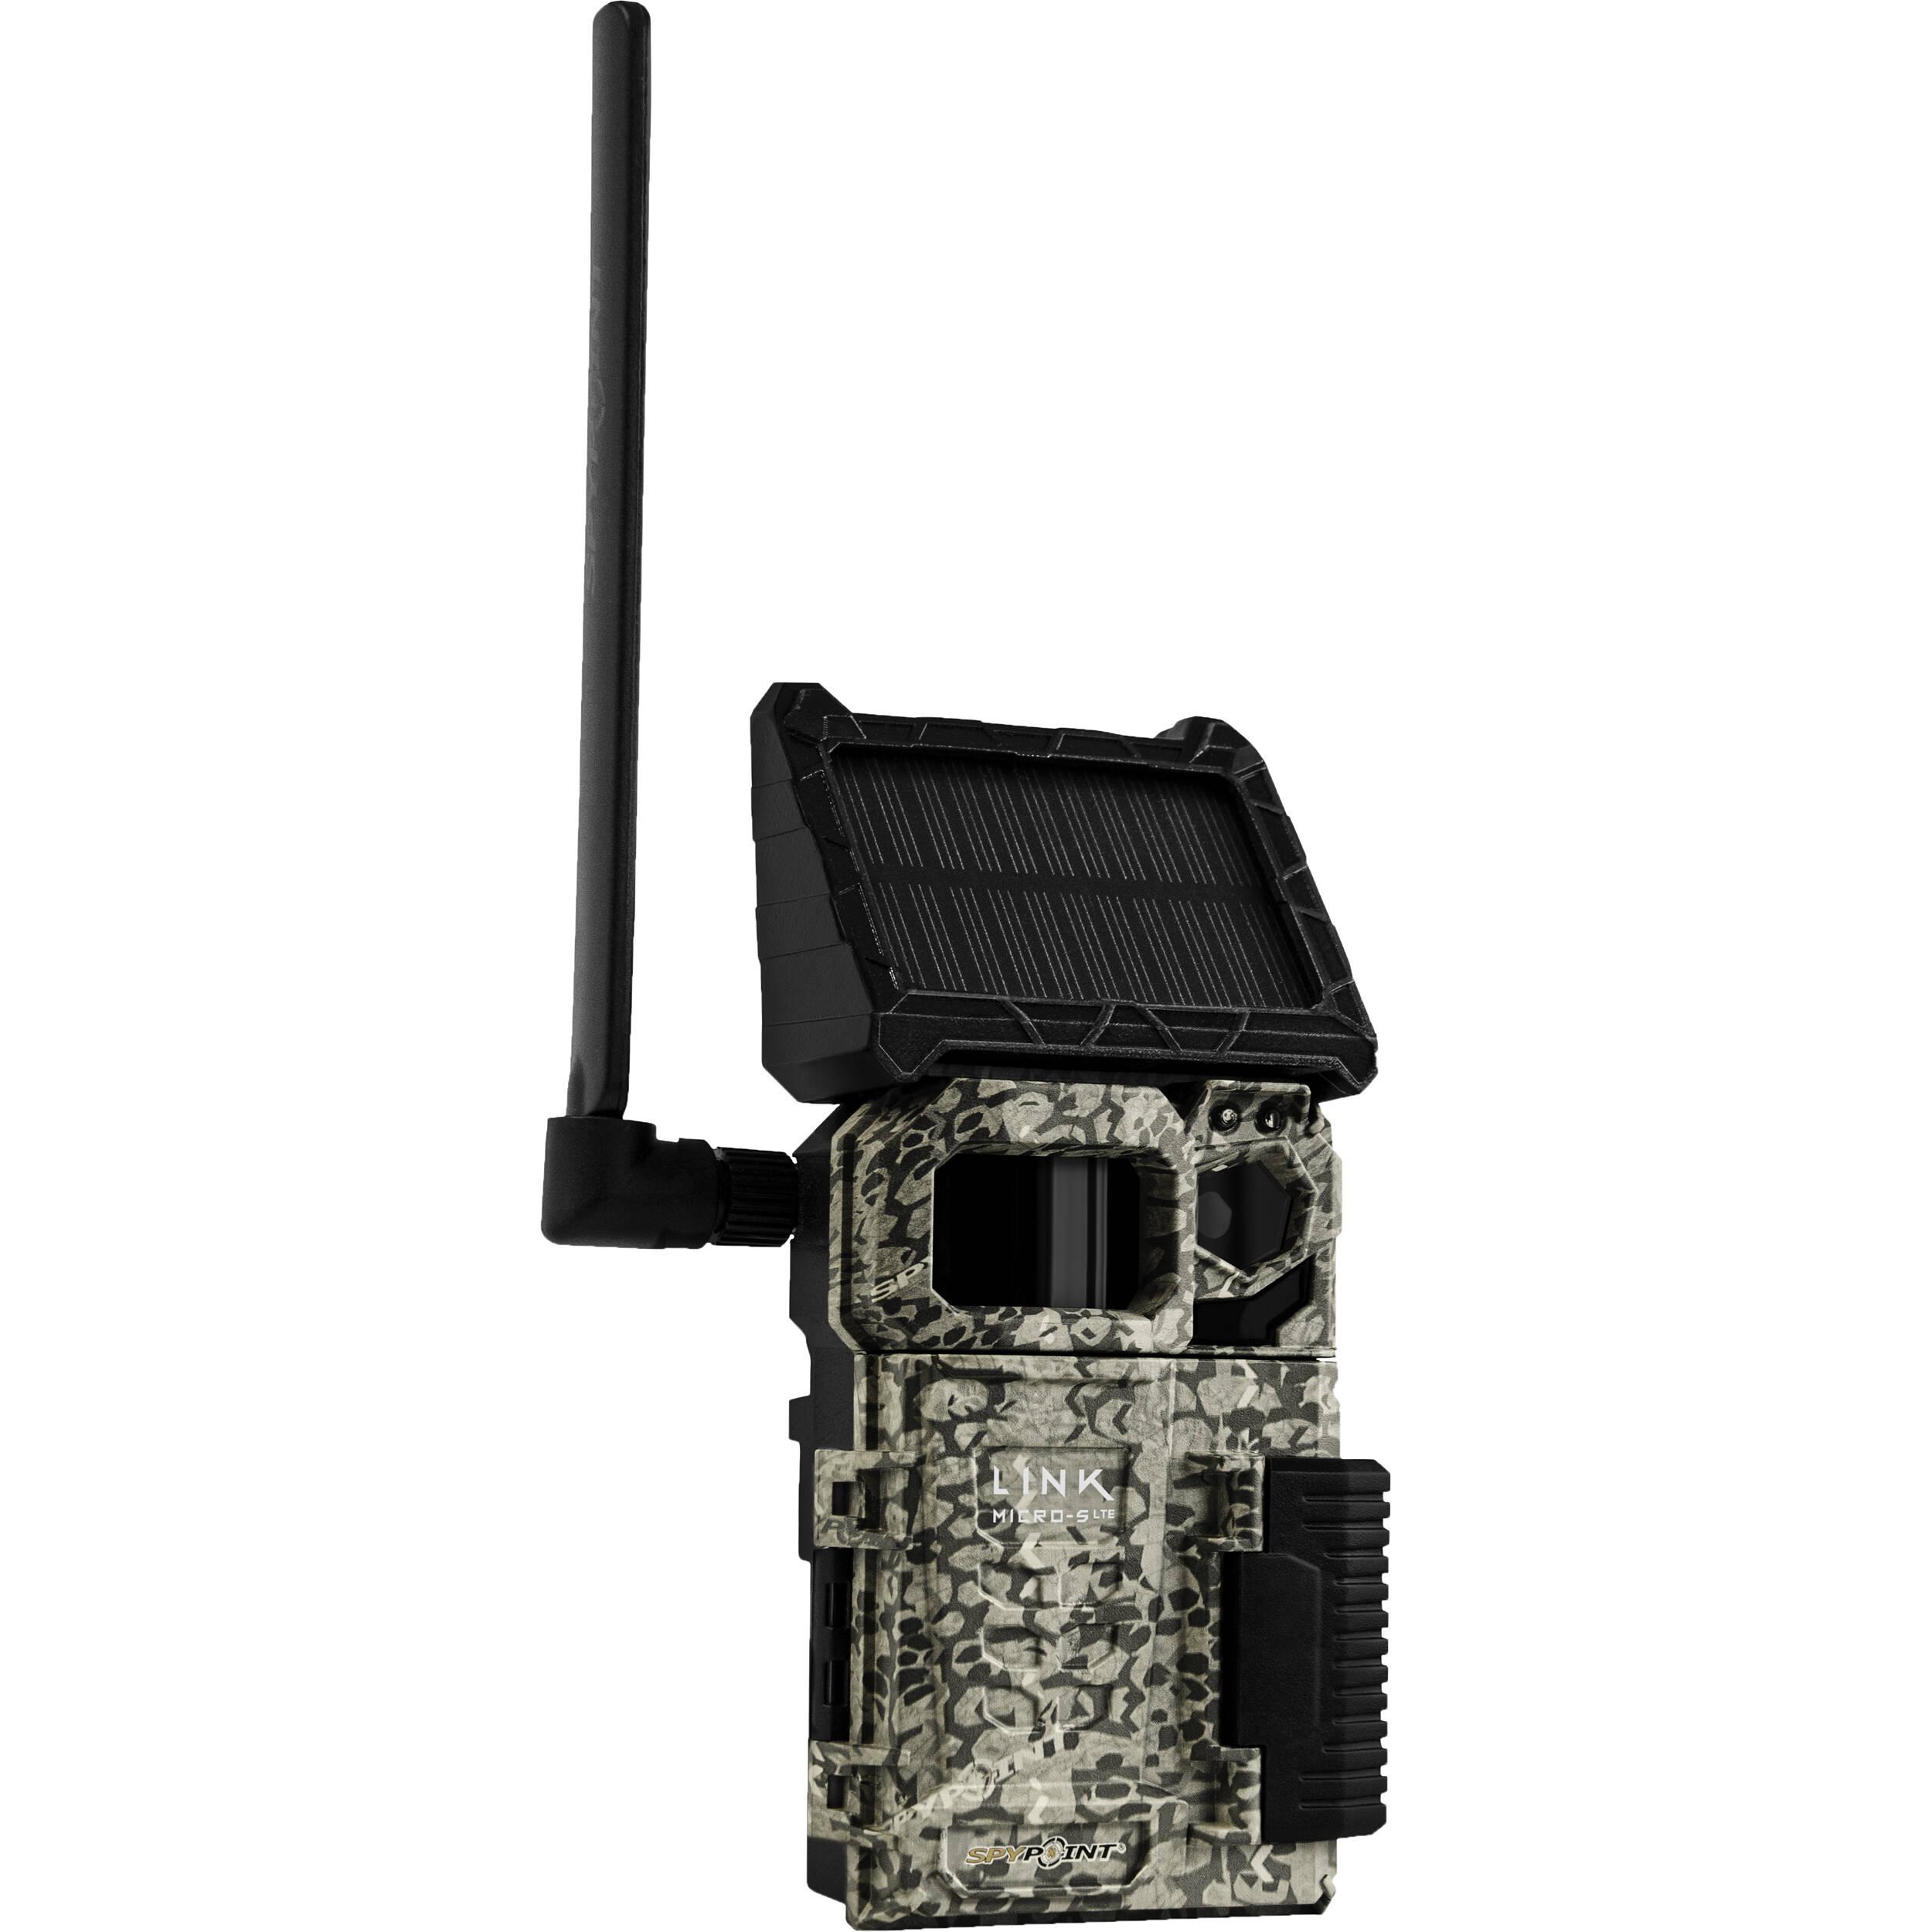 SMA Antenna Spypoint Link-Micro Verizon Cellular Trail Camera LINK-MICRO-LTE-V